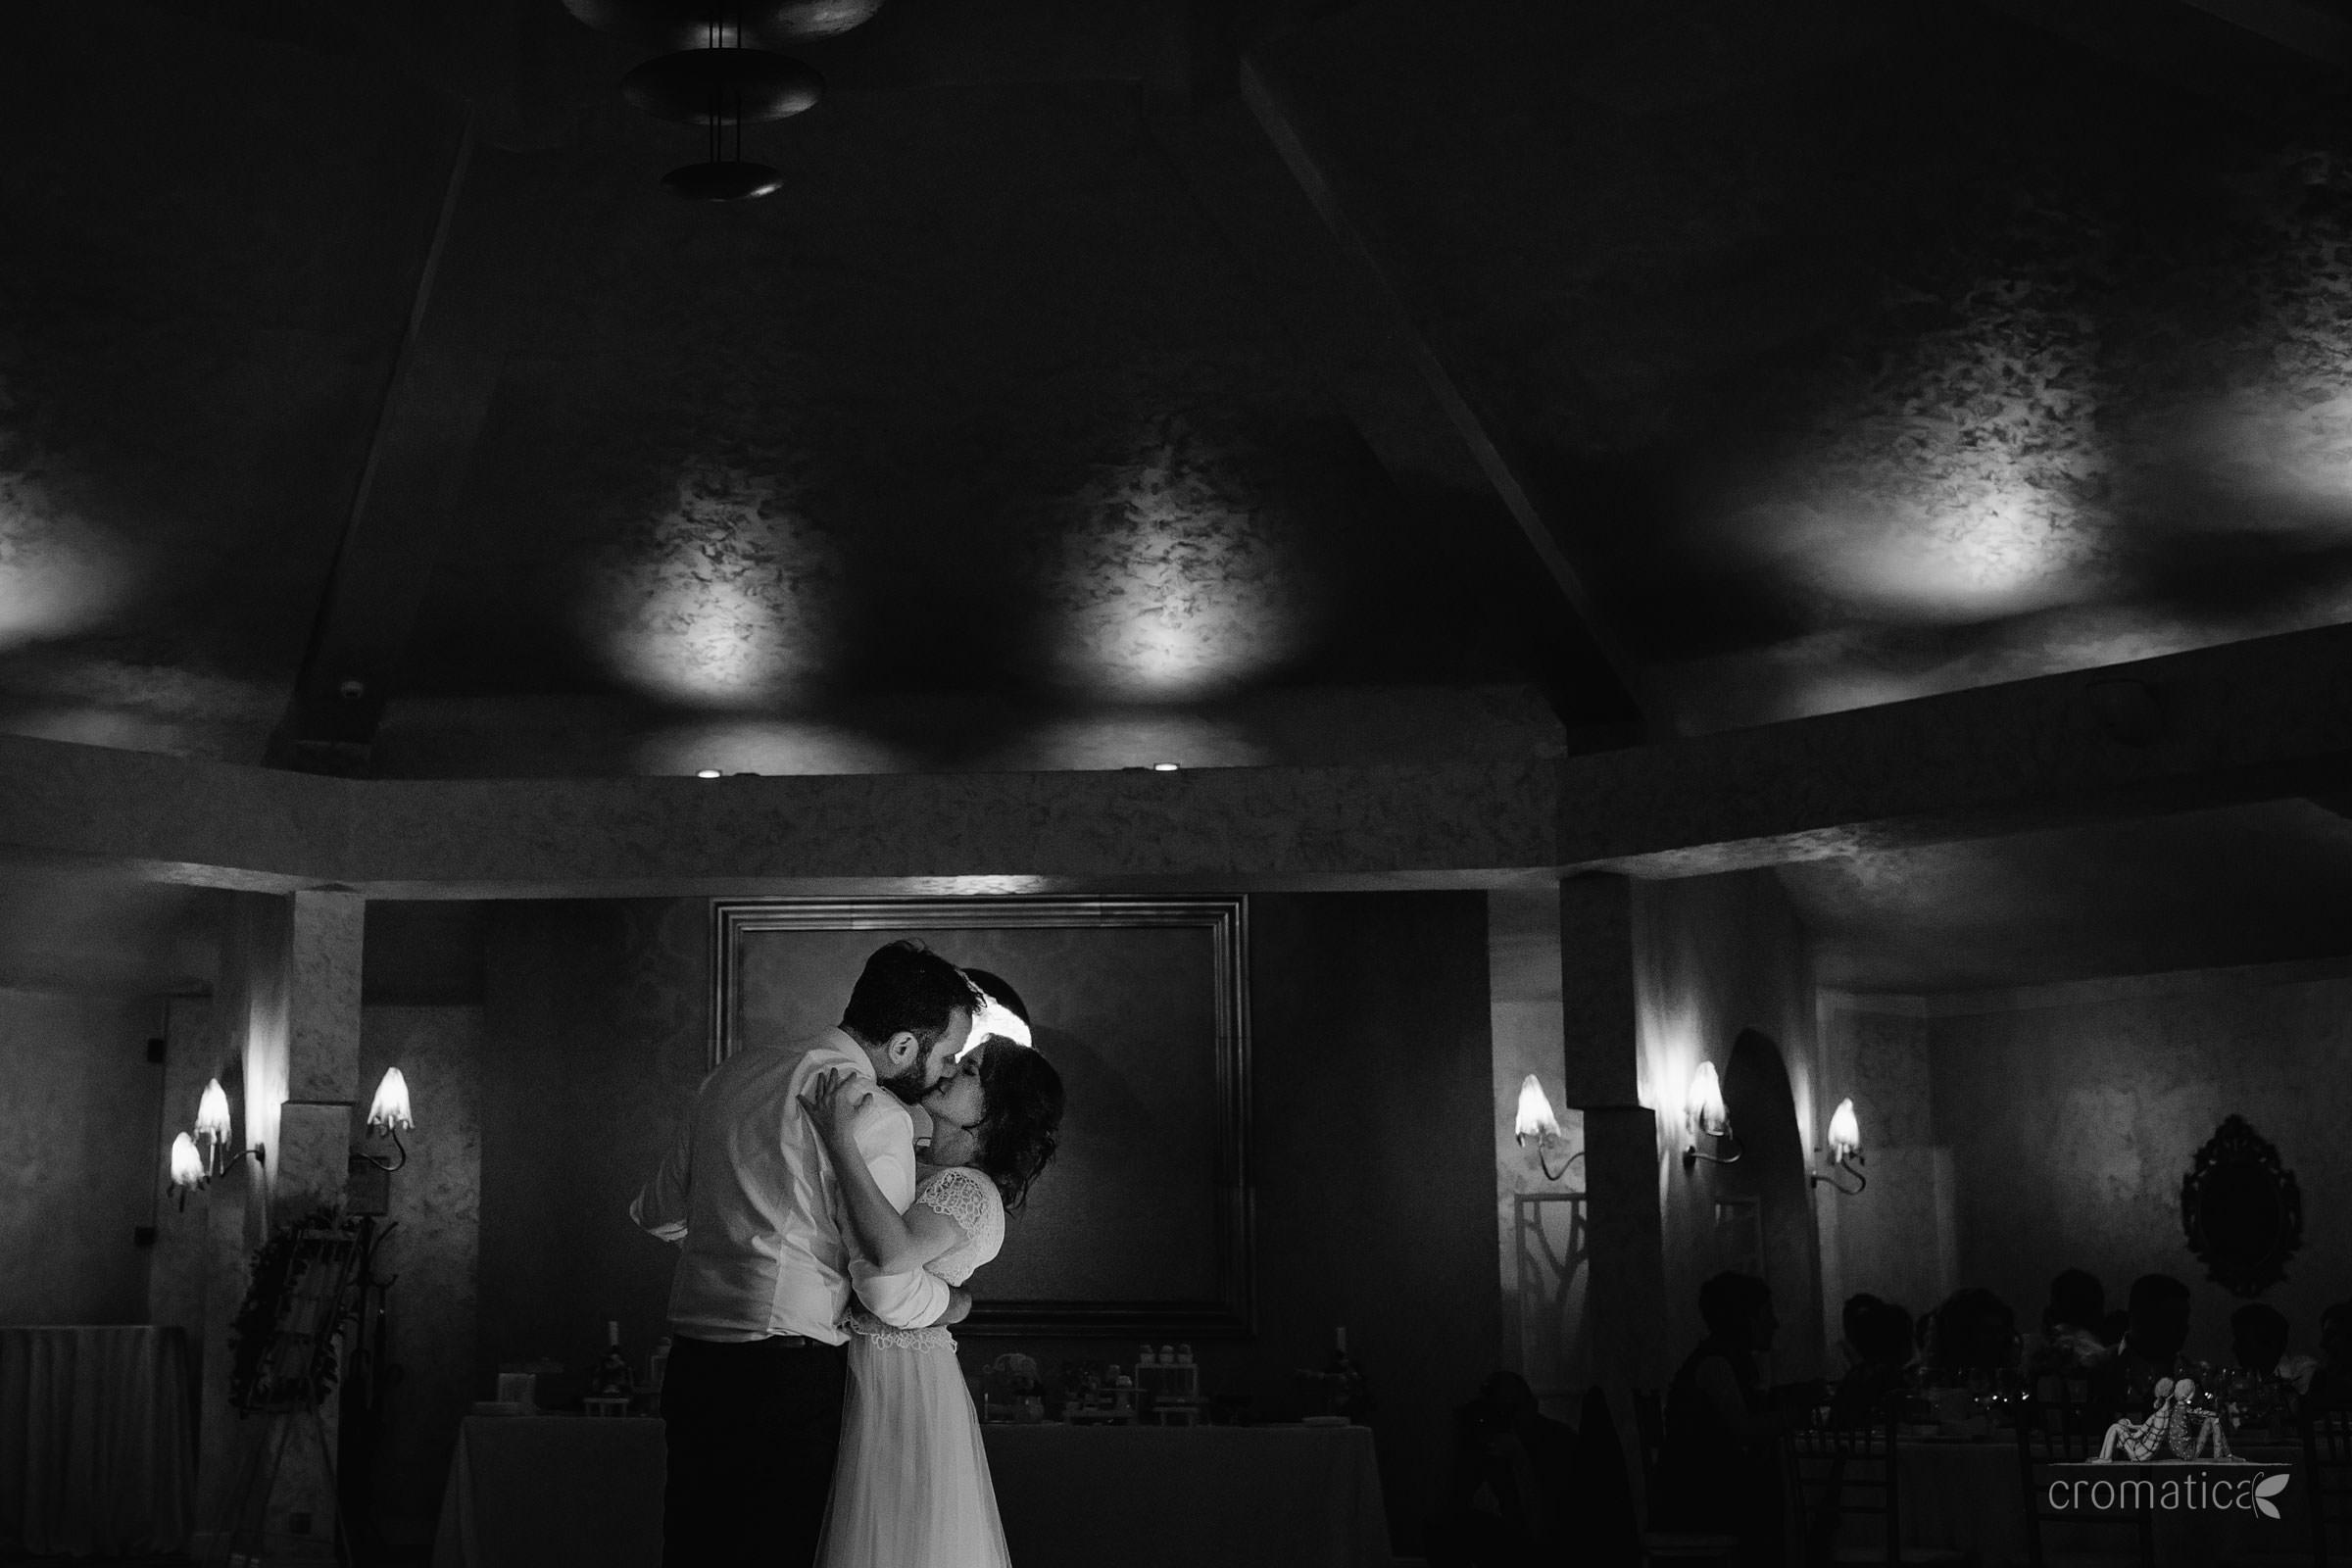 roxana mihai fotografii nunta la seratta 101